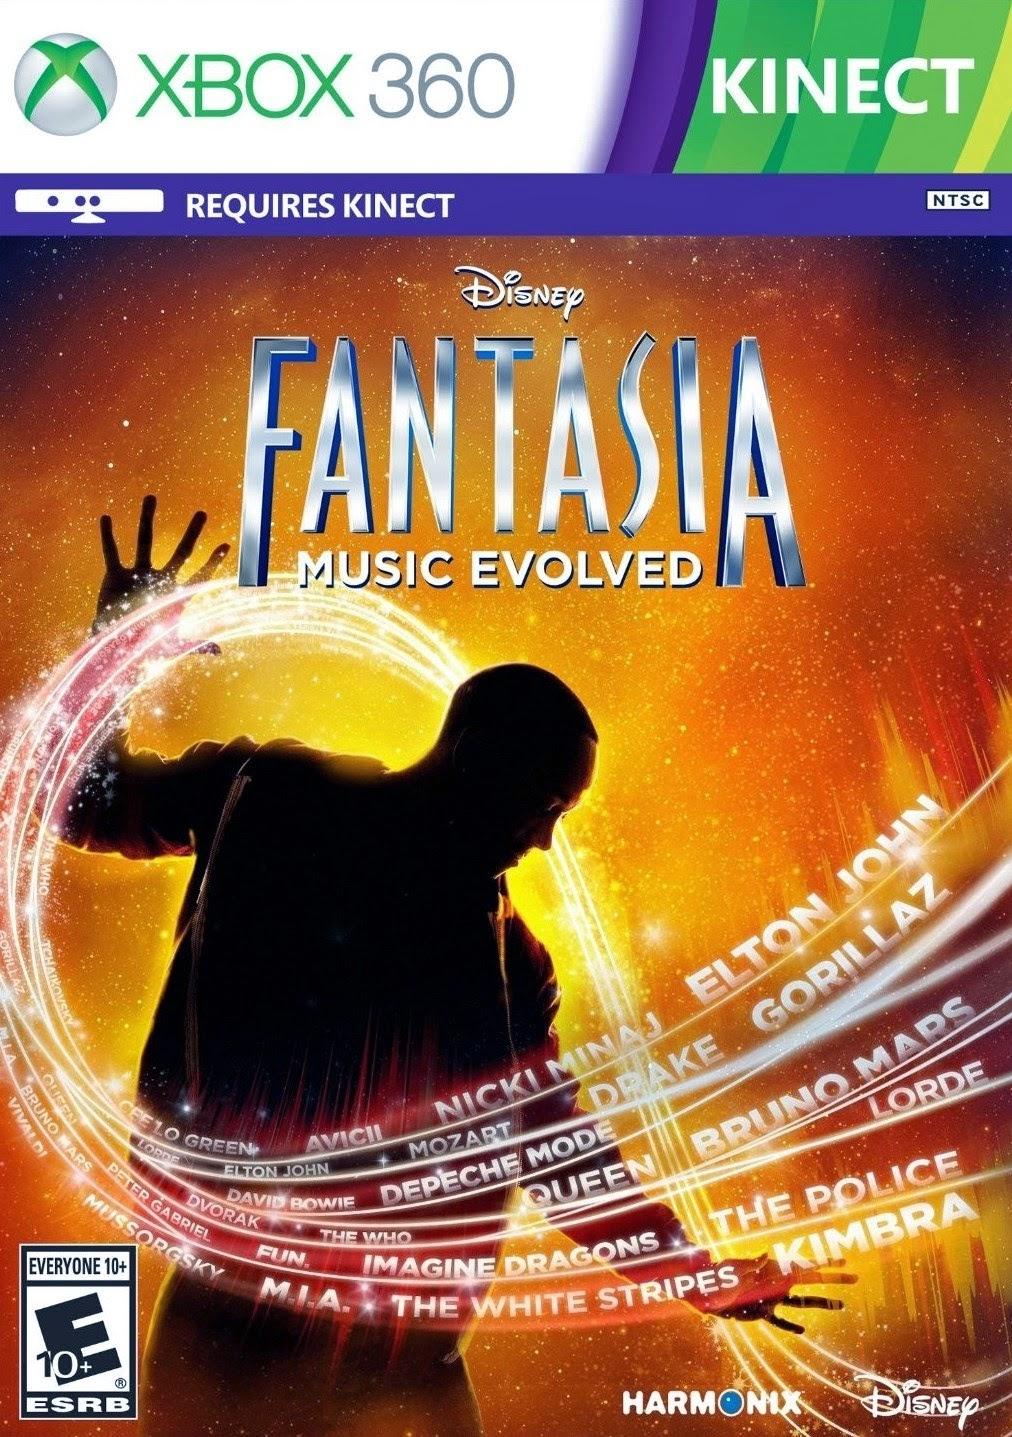 Disney Fantasia Music Evolved XBOX360 free download full version